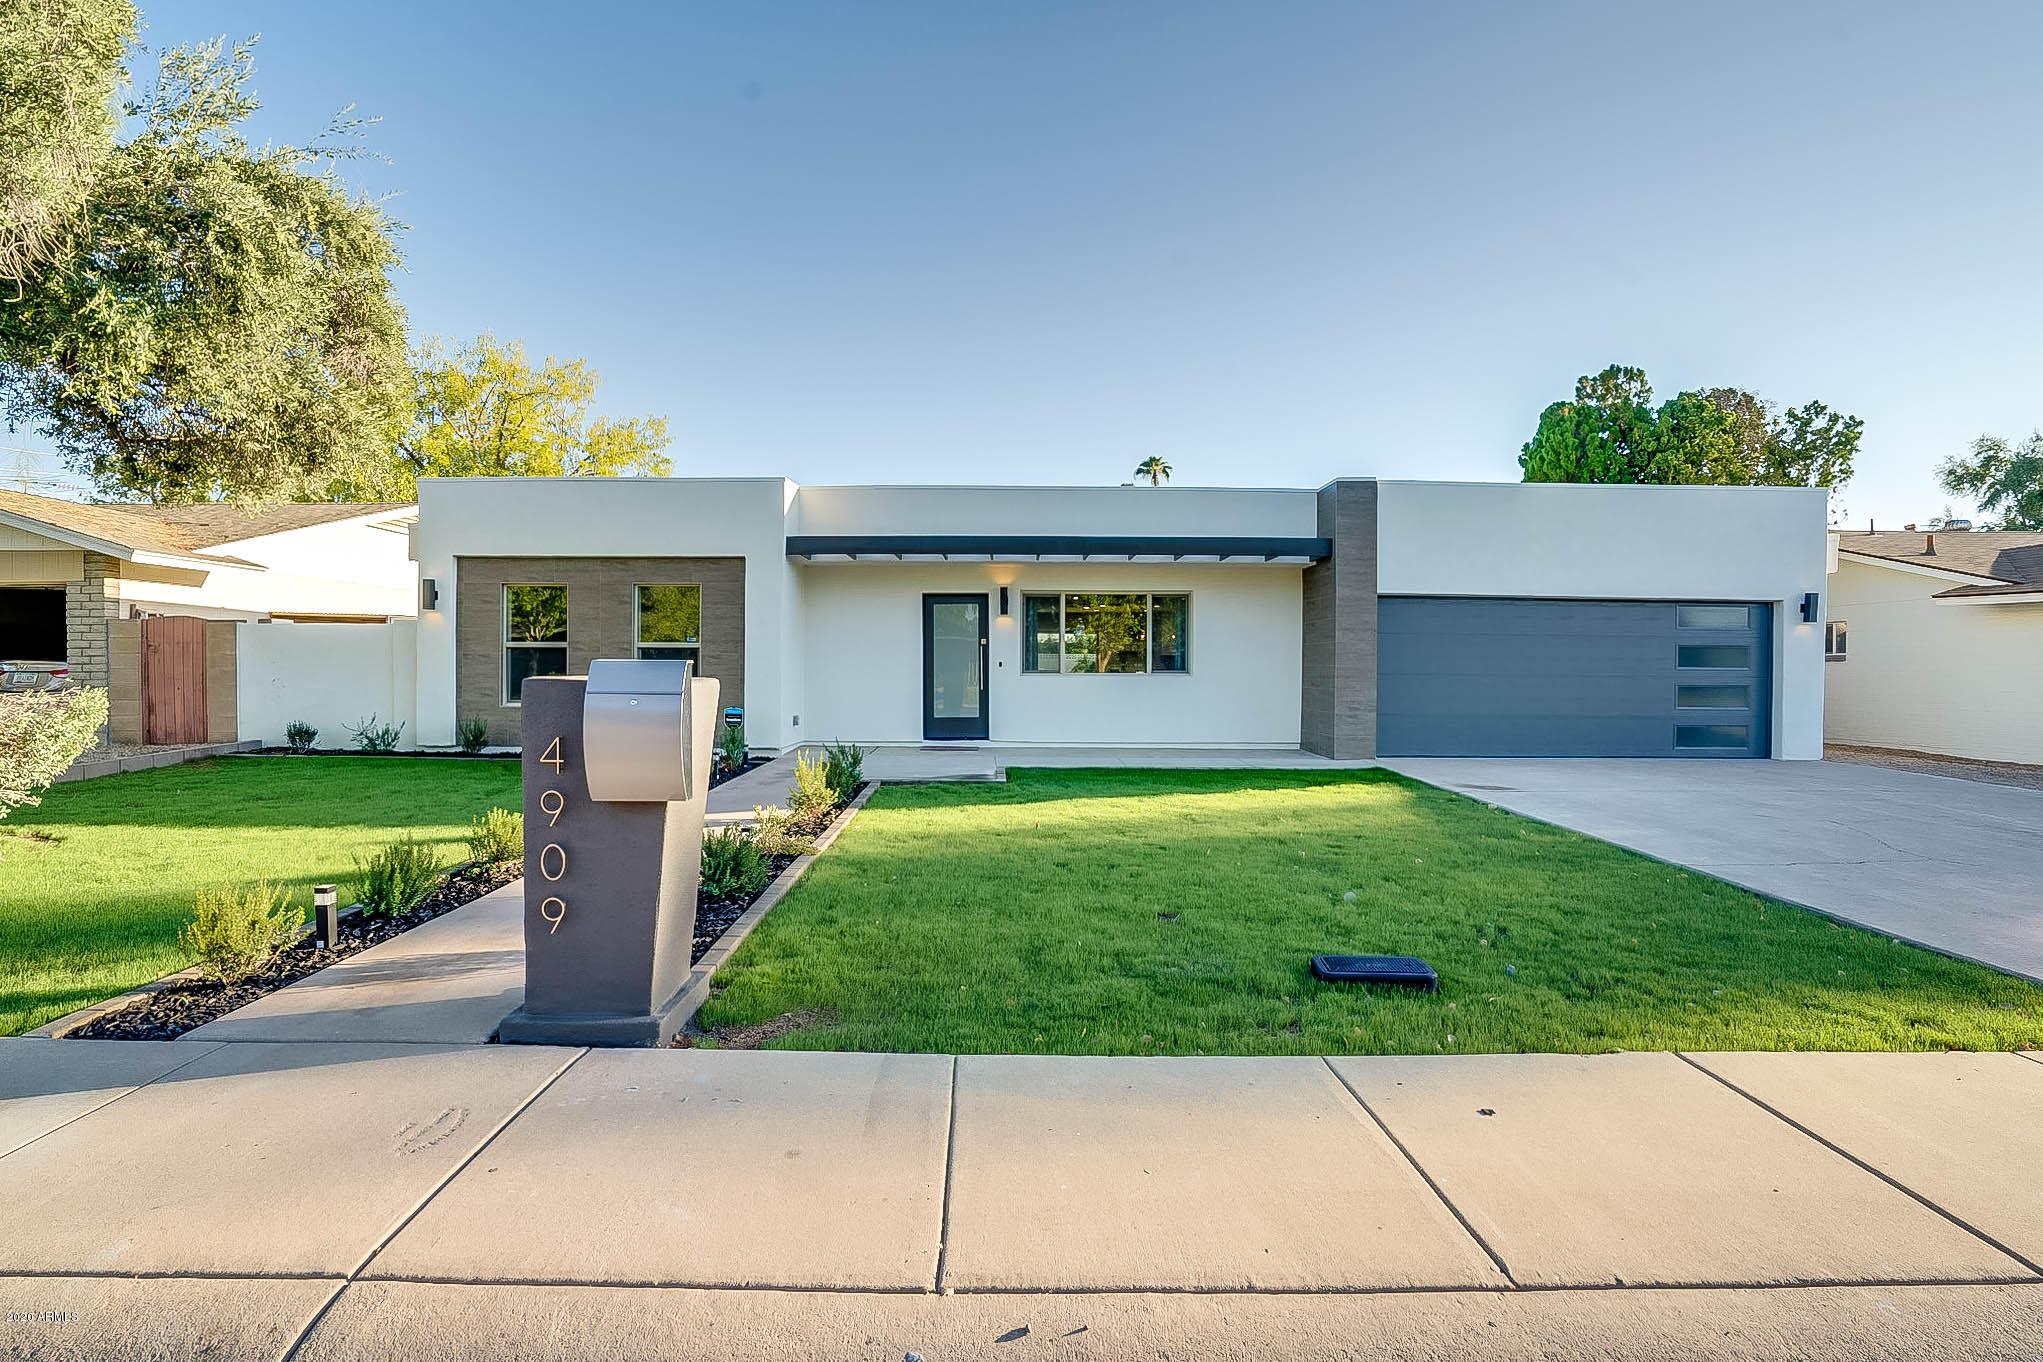 Photo of 4909 E PINCHOT Avenue, Phoenix, AZ 85018